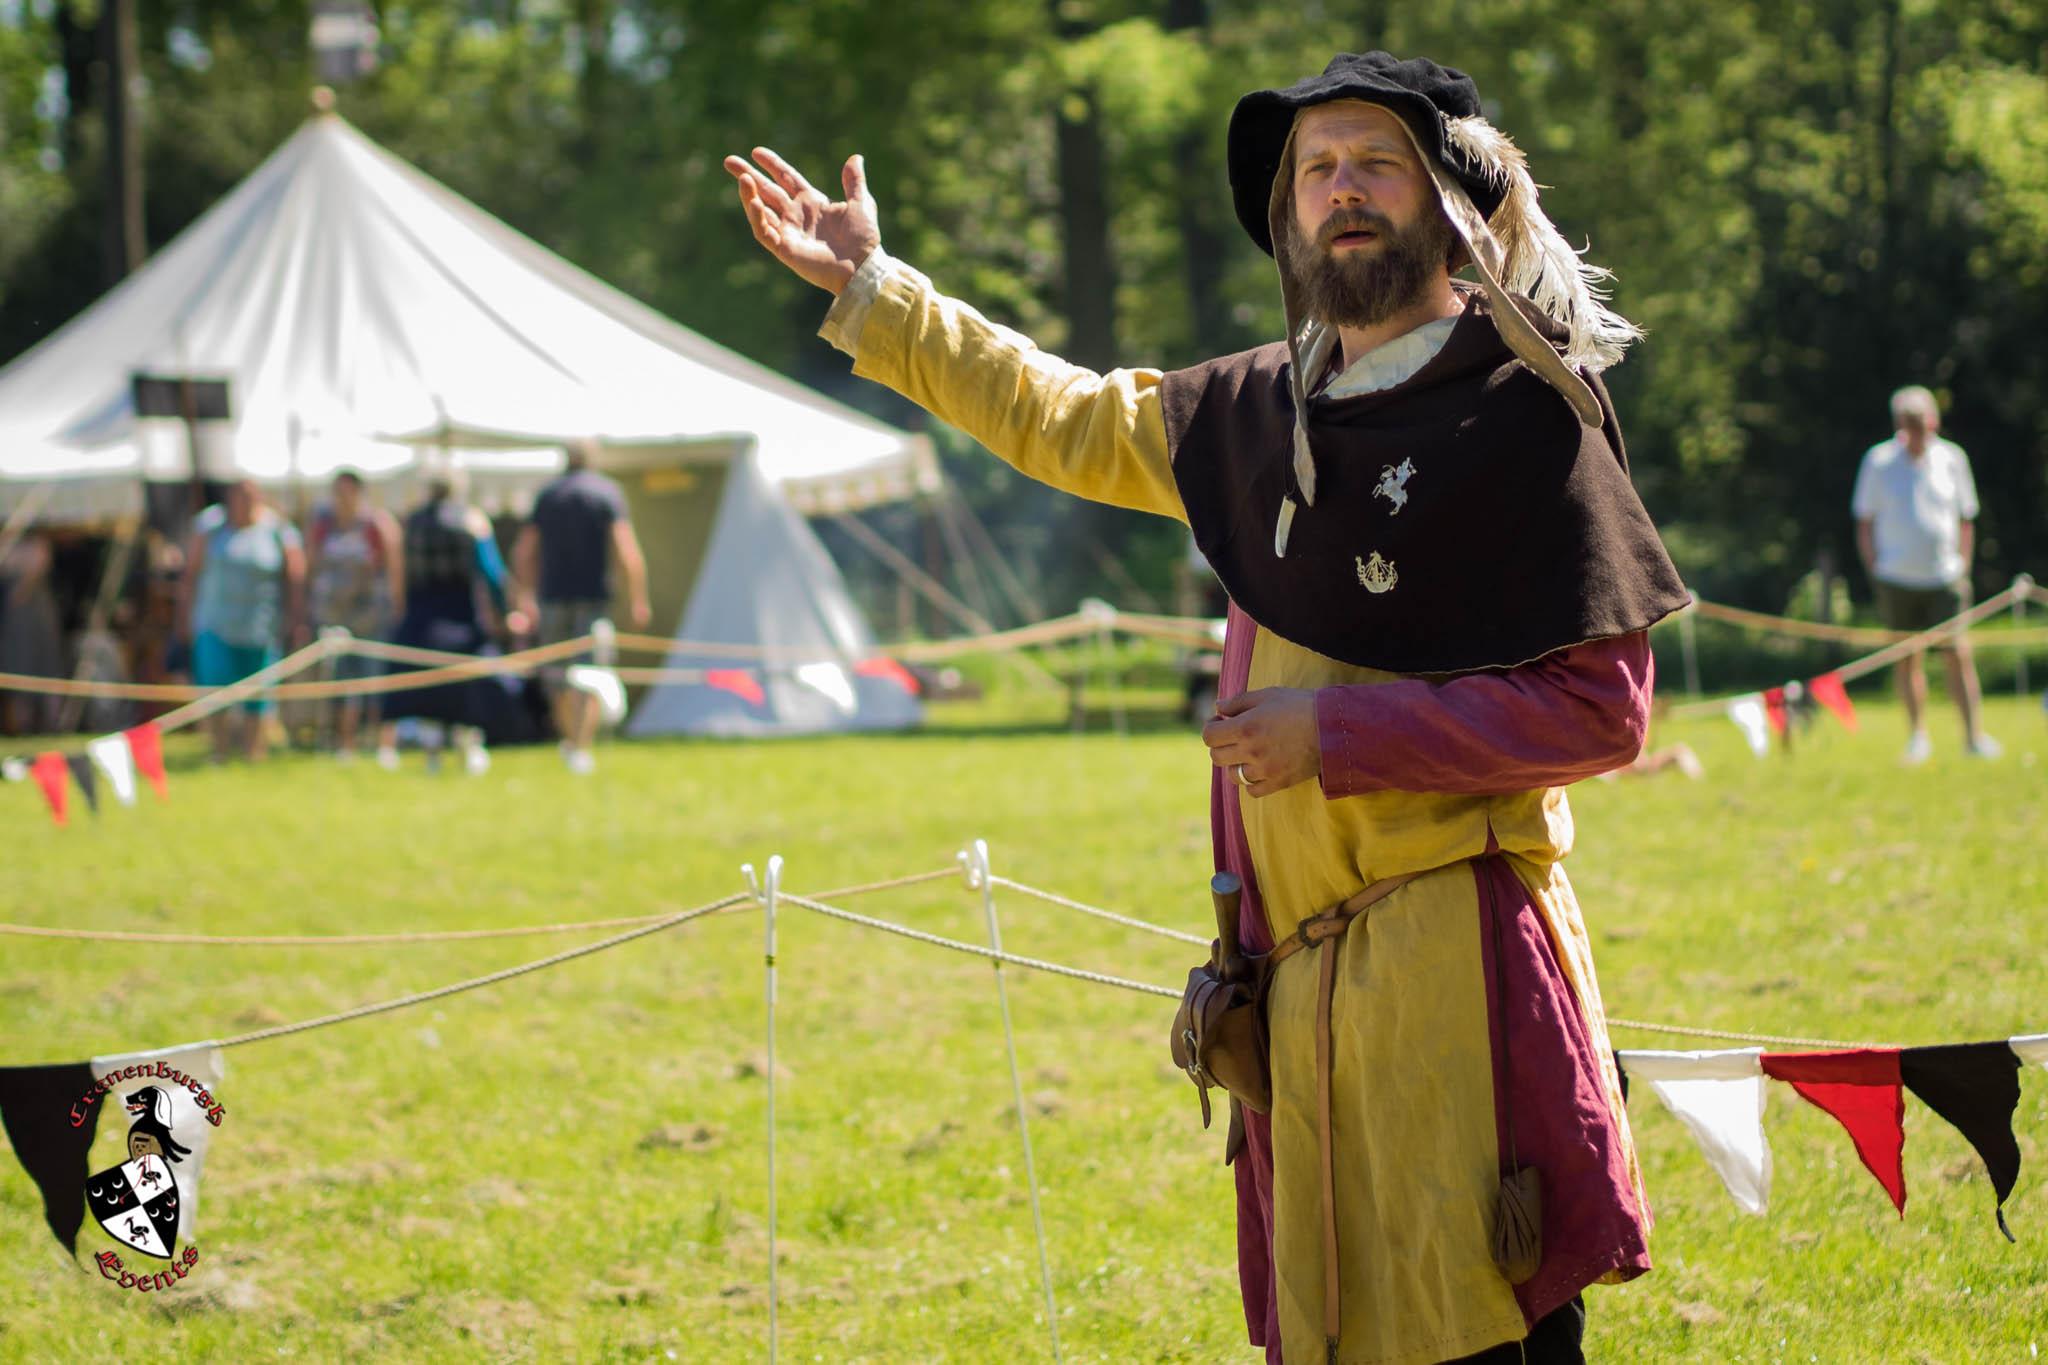 Middeleeuws-Festijn-Cannenburgh-2018-Algemeen-Ellen-la-Faille-28